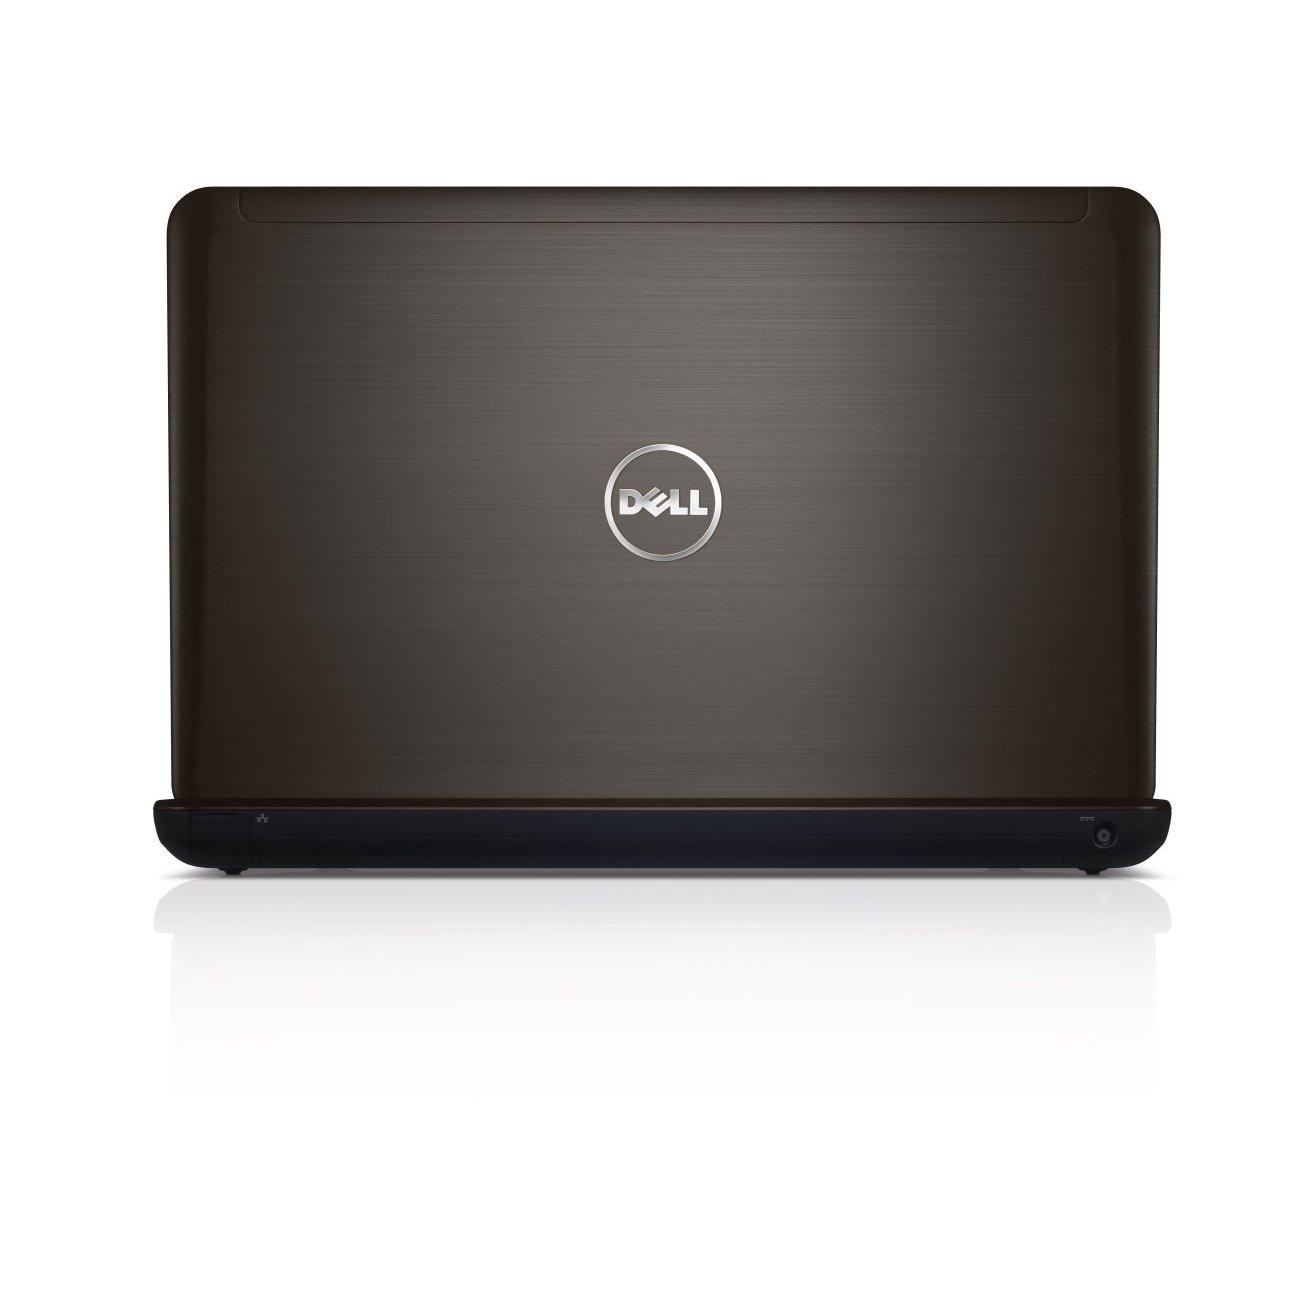 https://thetechjournal.com/wp-content/uploads/images/1204/1333304418-dell-inspiron-i14z2877bk-14inch-laptop-5.jpg